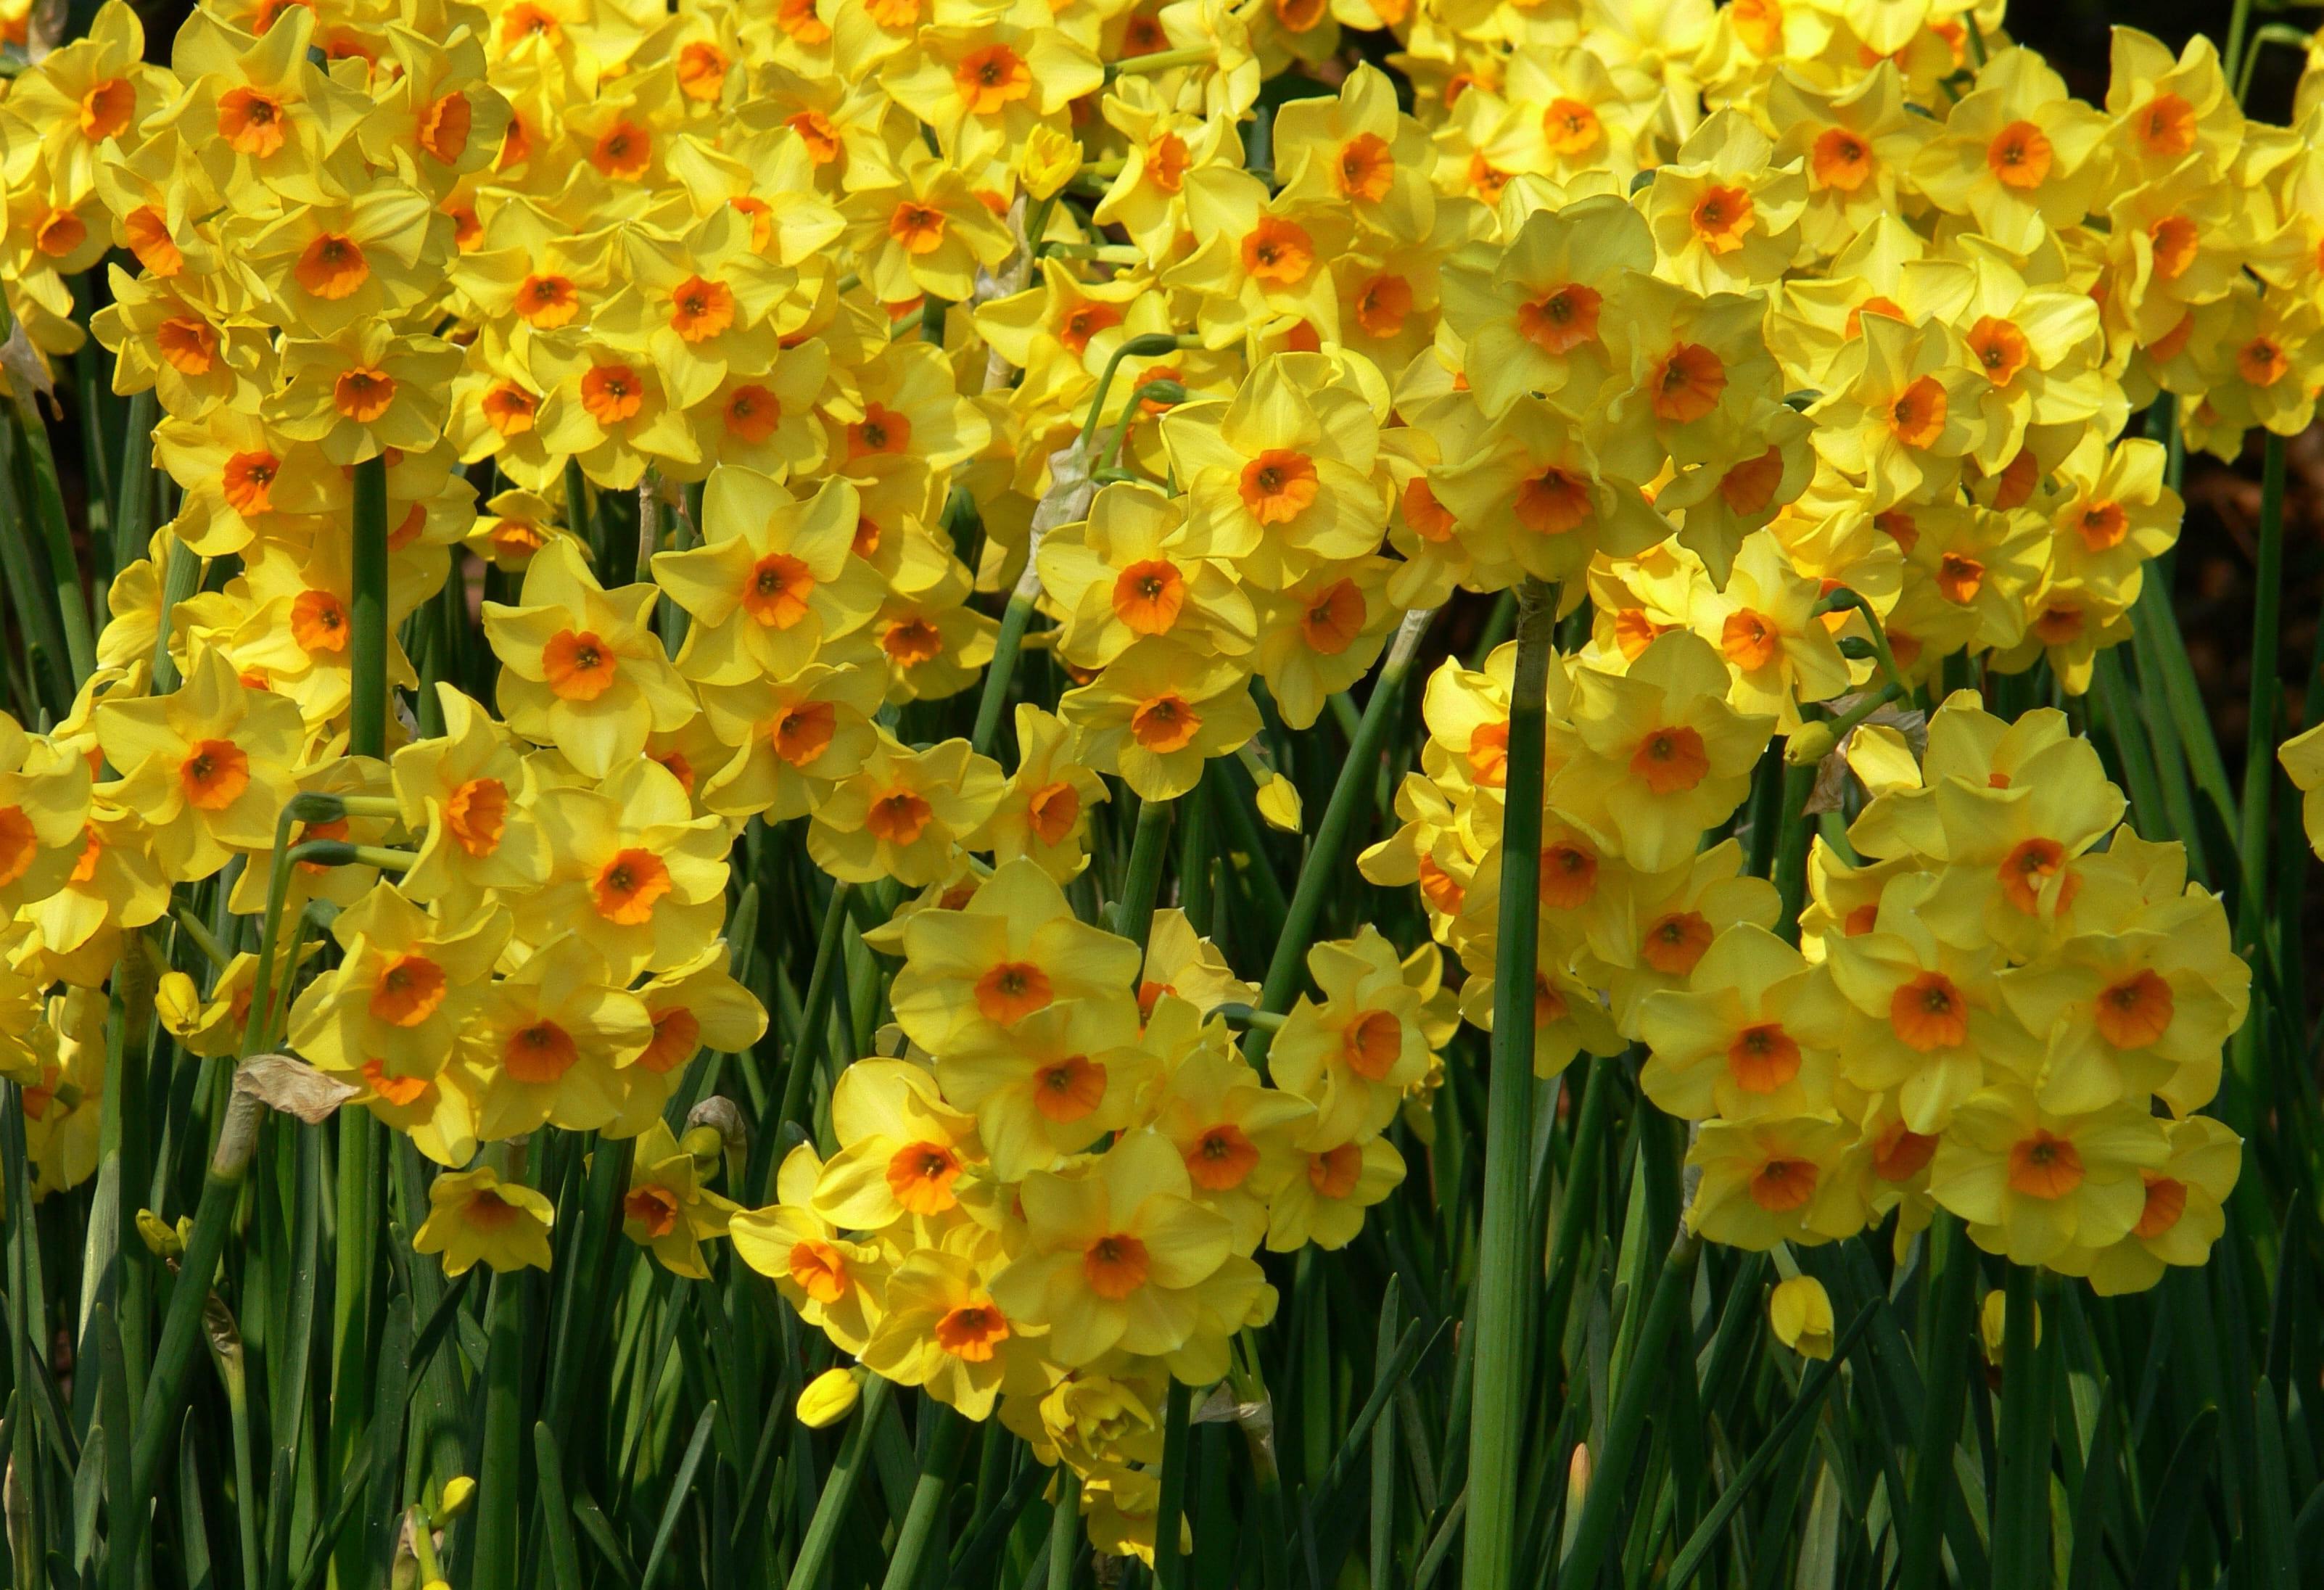 daffodils-photo-61